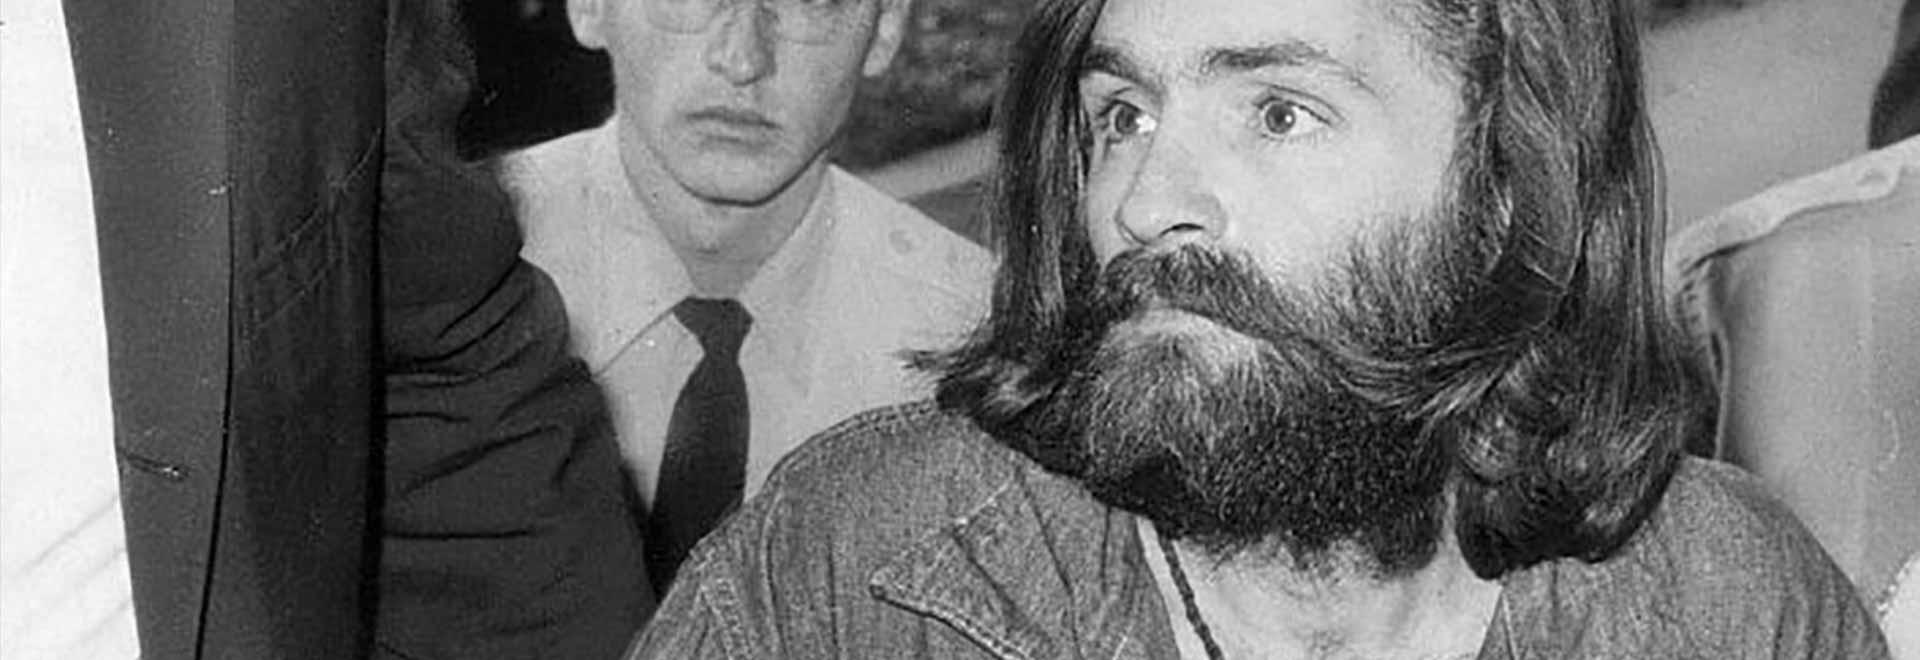 Manson - Sangue del mio sangue